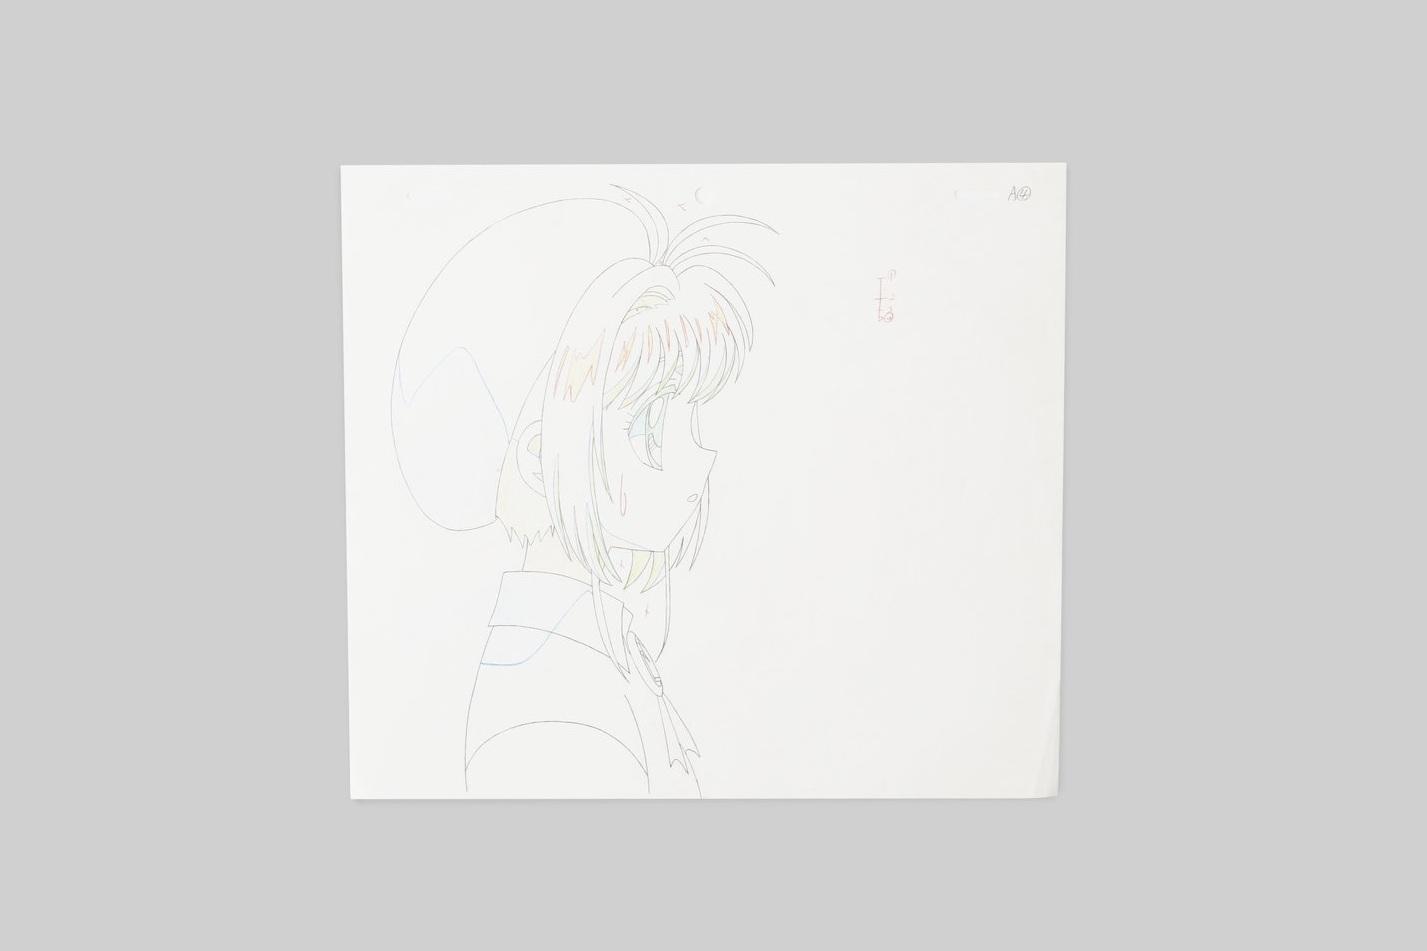 unun_cell-sakura-cardcapter_12.1.jpg